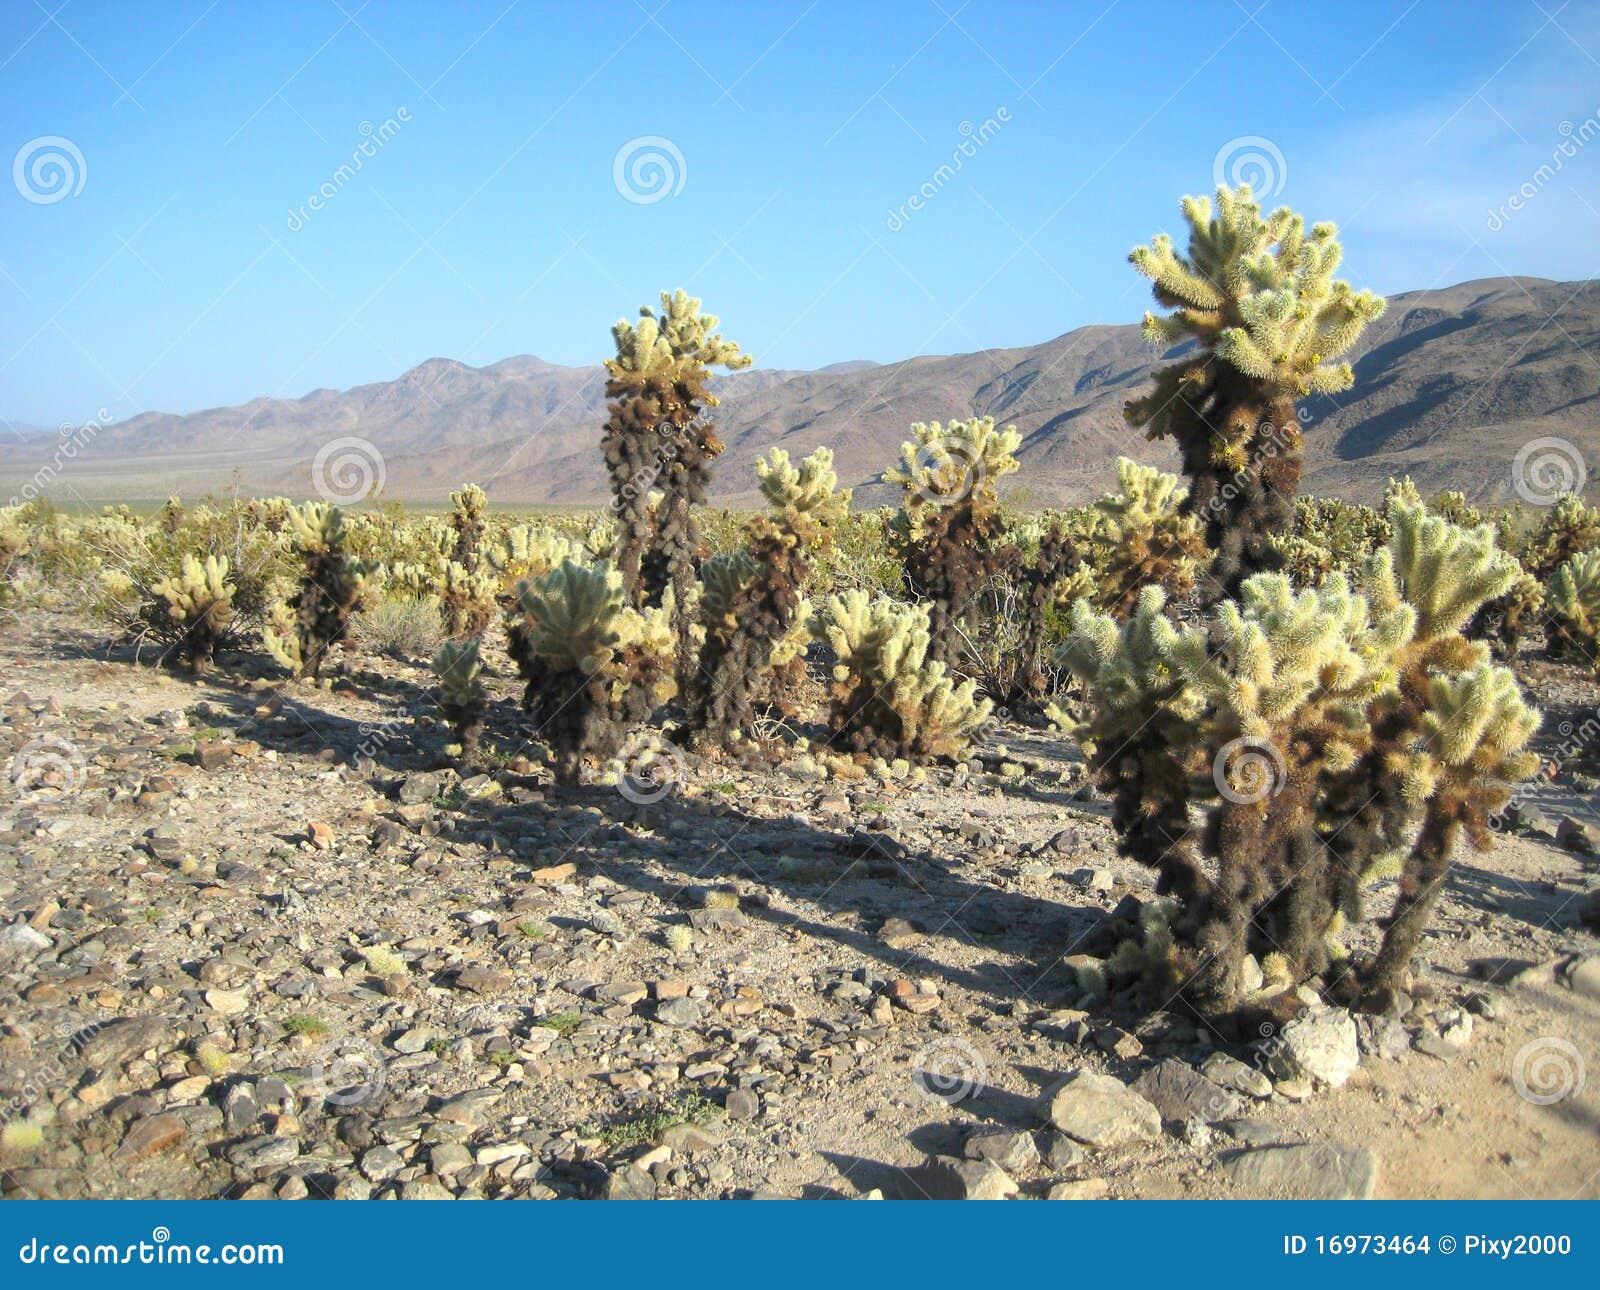 Joshua Tree National Park Cholla Cactus Garden Stock Images Image 16973464